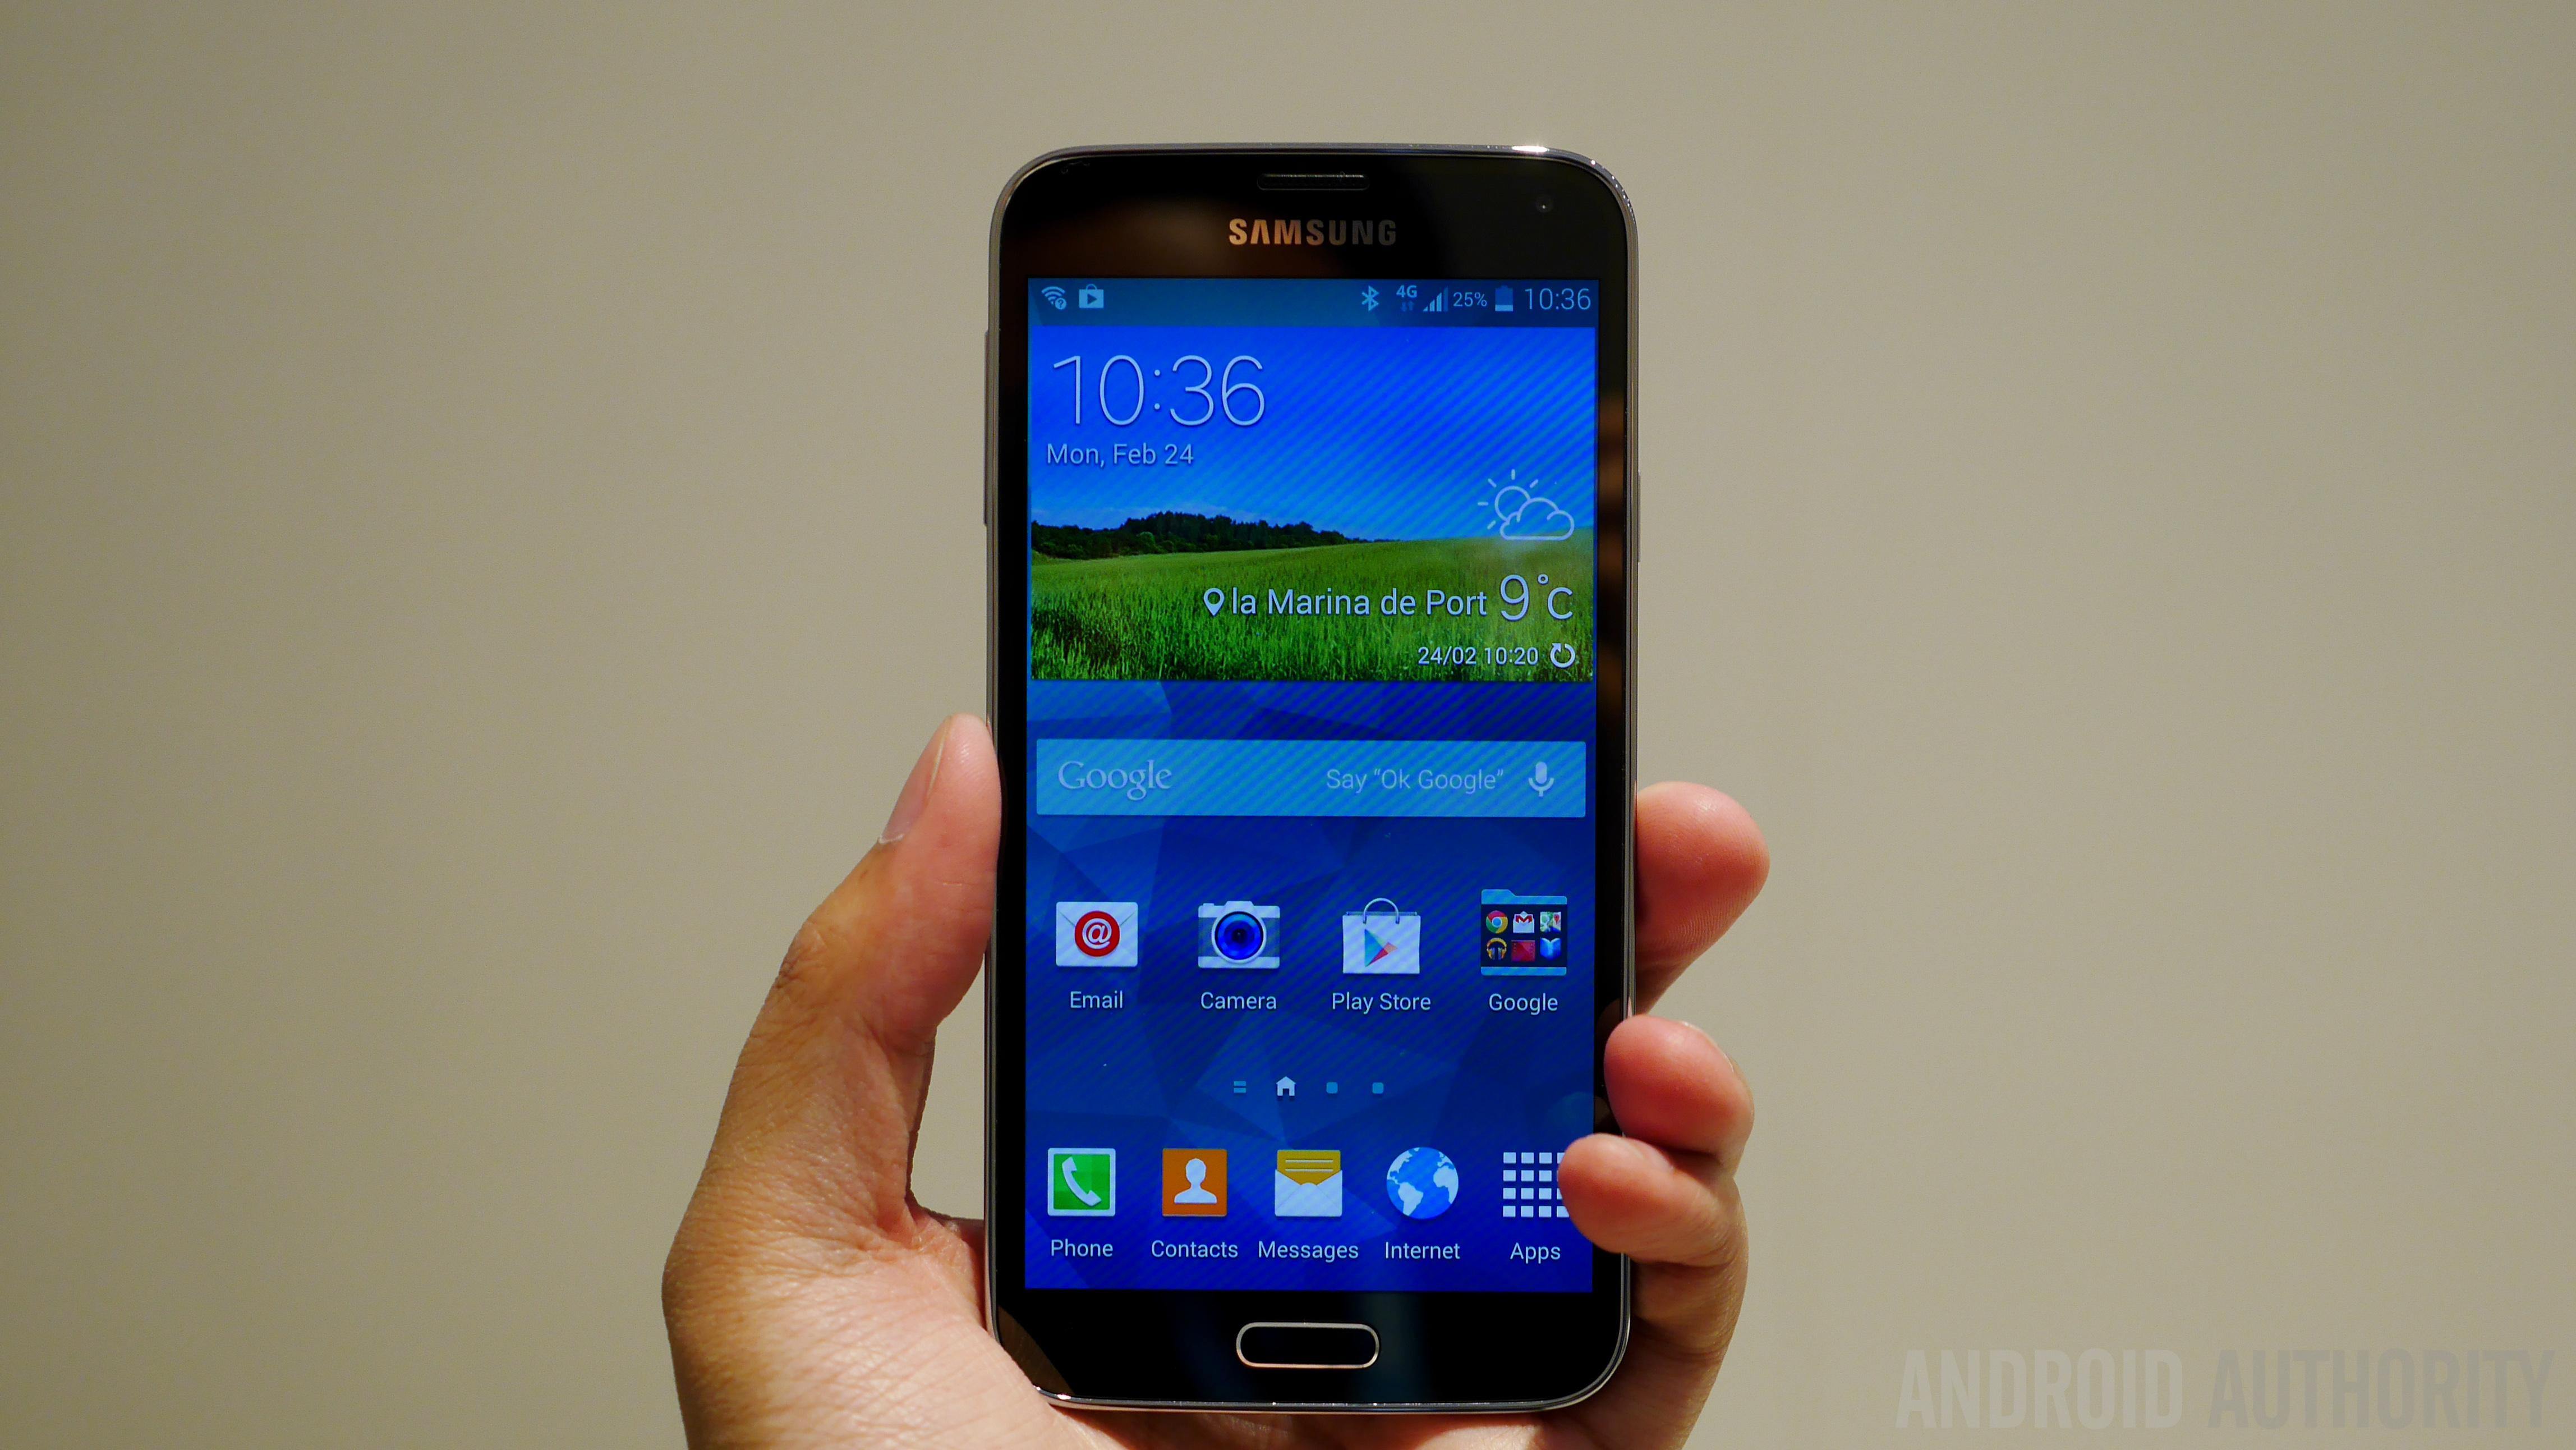 Samsung Galaxy S5 Hands on MWC 2014-1160049